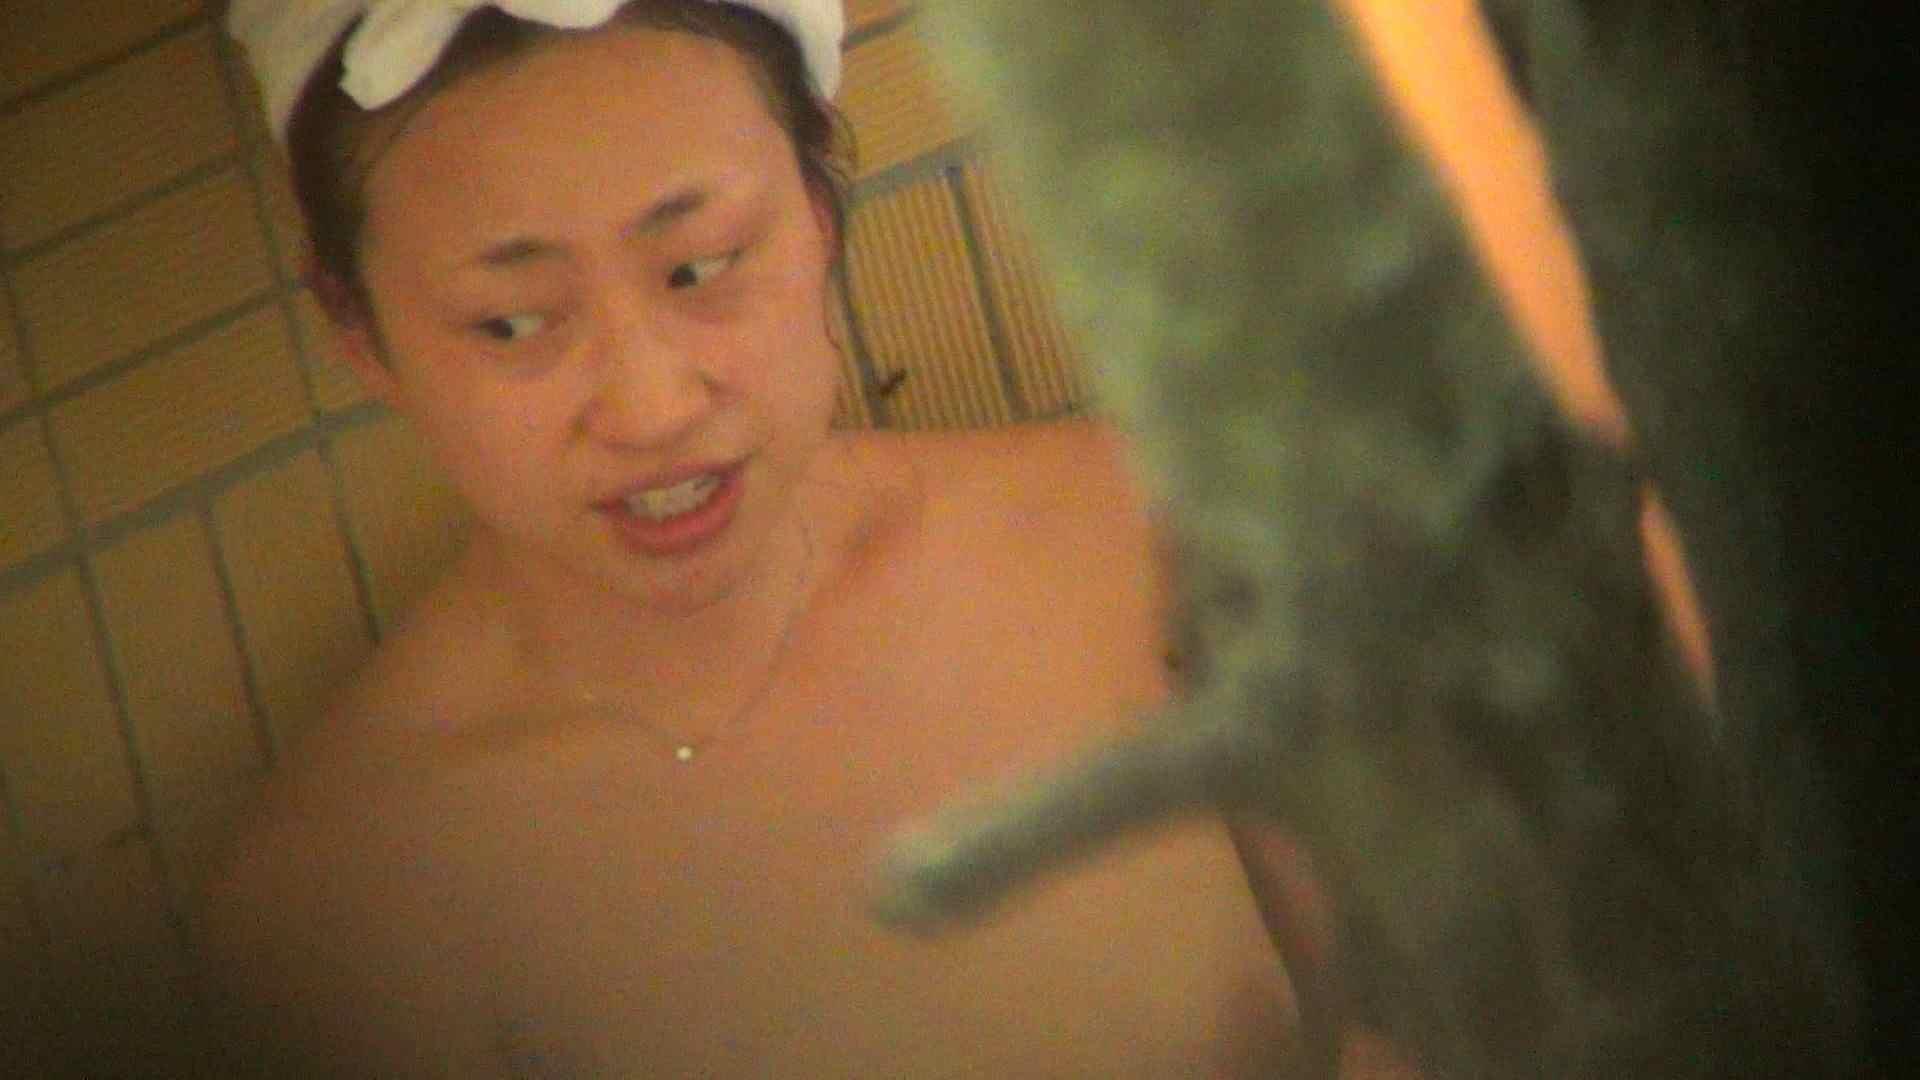 Vol.80 出産経験済みの弛んだ肉体と大胆すぎるアングル 露天覗き 濡れ場動画紹介 79枚 3